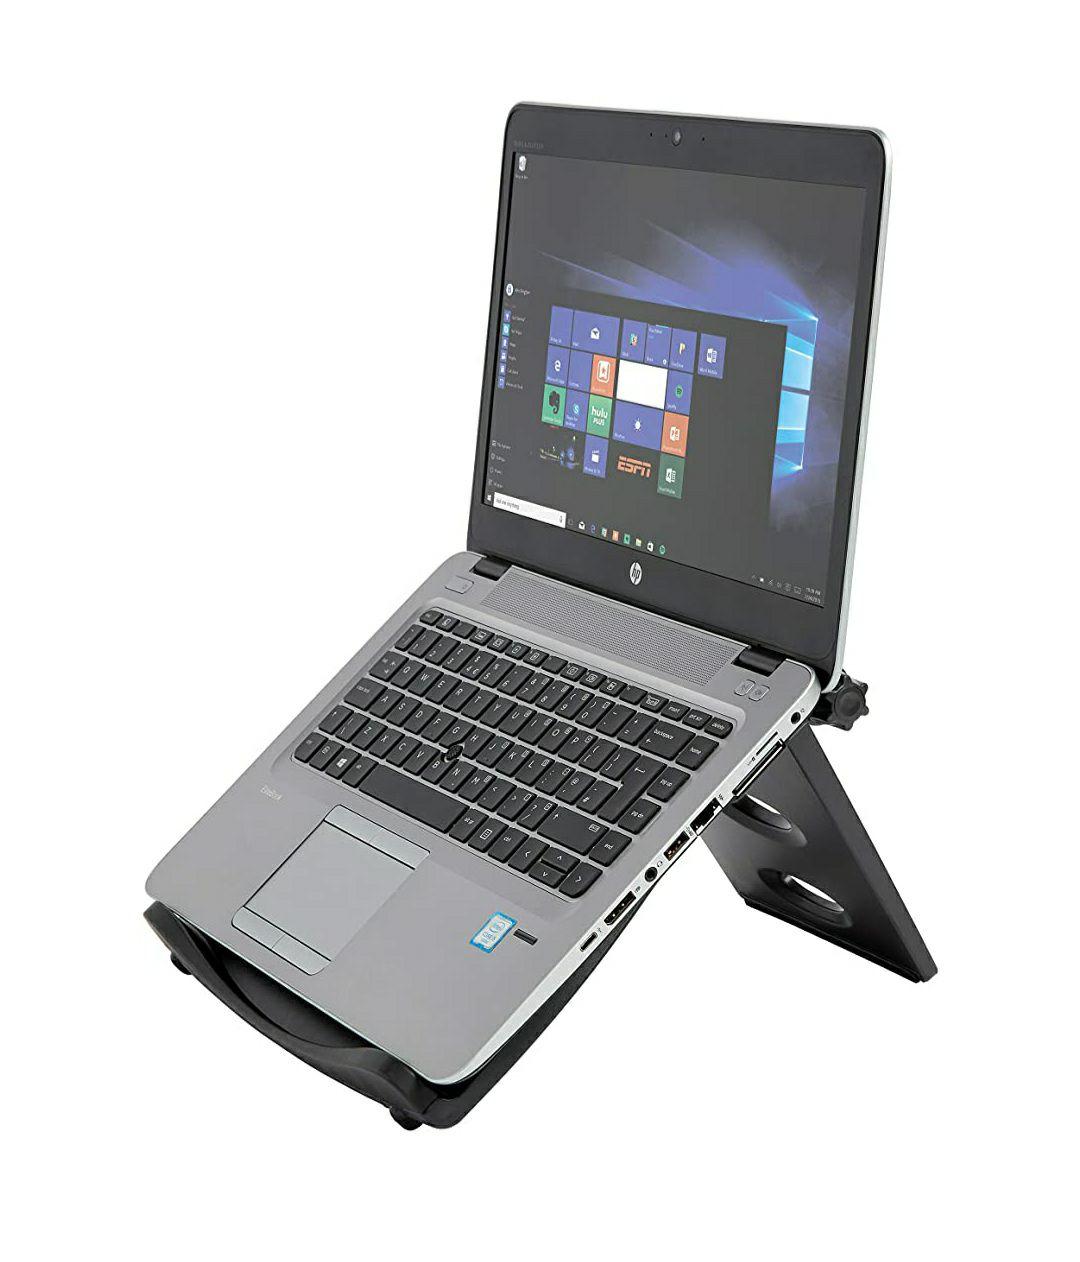 Kensington Easy Riser Portable Ergonomic Laptop Cooling Stand £8.43 (+£4.49 non-prime) @ Amazon